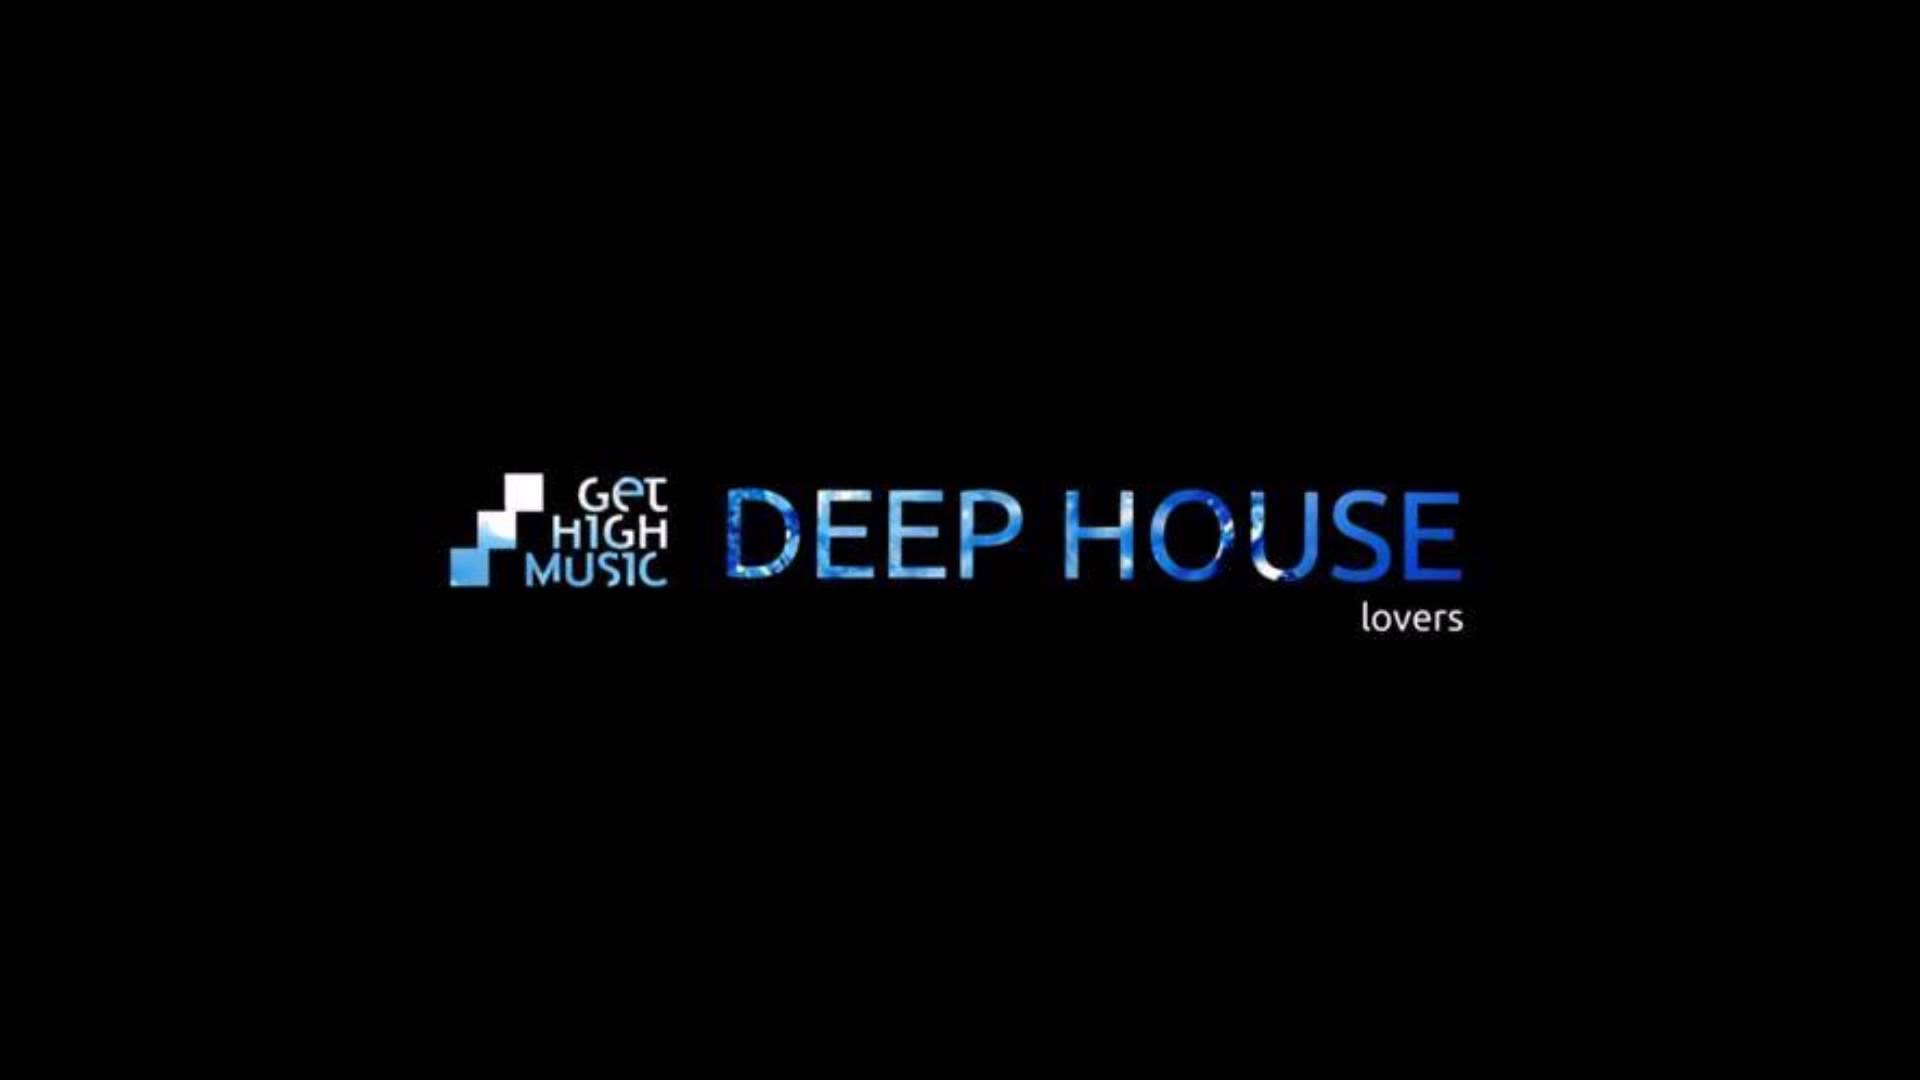 Deep House Mix HD 2014 Ambient Music Lounge Music 1920x1080